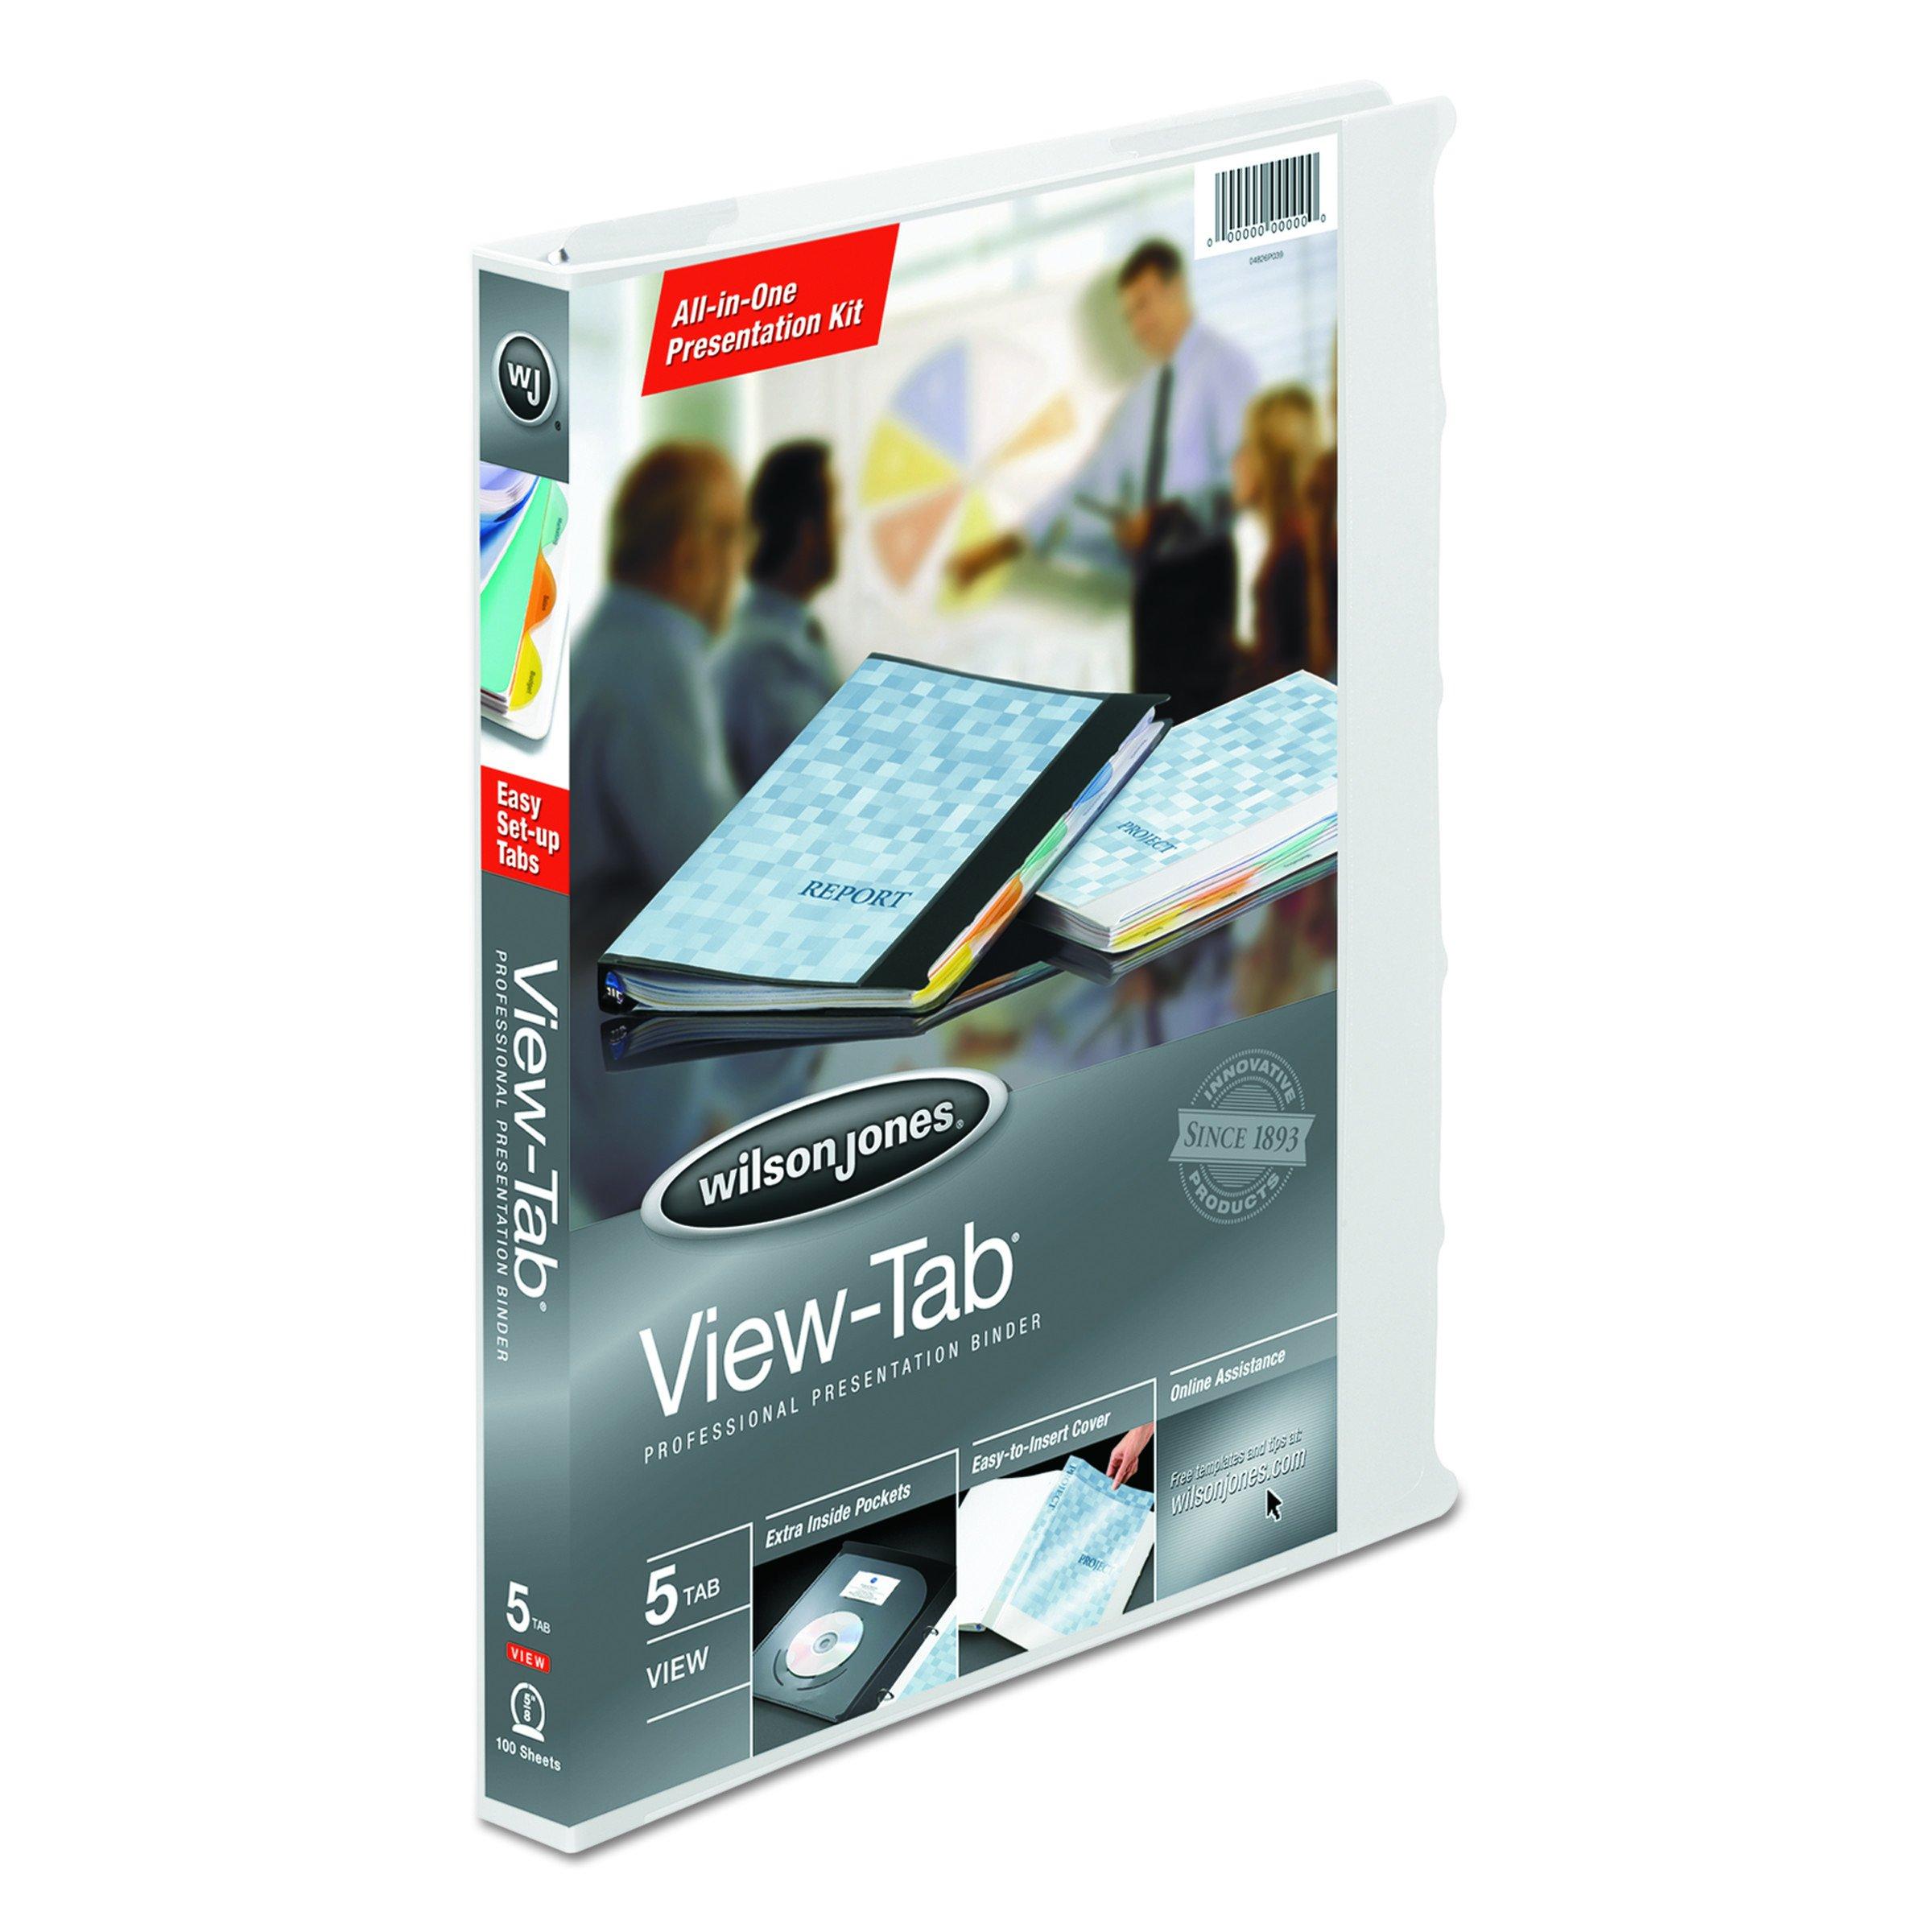 Wilson Jones View-tab Presentation 5-Tab Binder, 5/8'' Capacity, 8.5'' x 11'' Sheet Size, White (W55364)